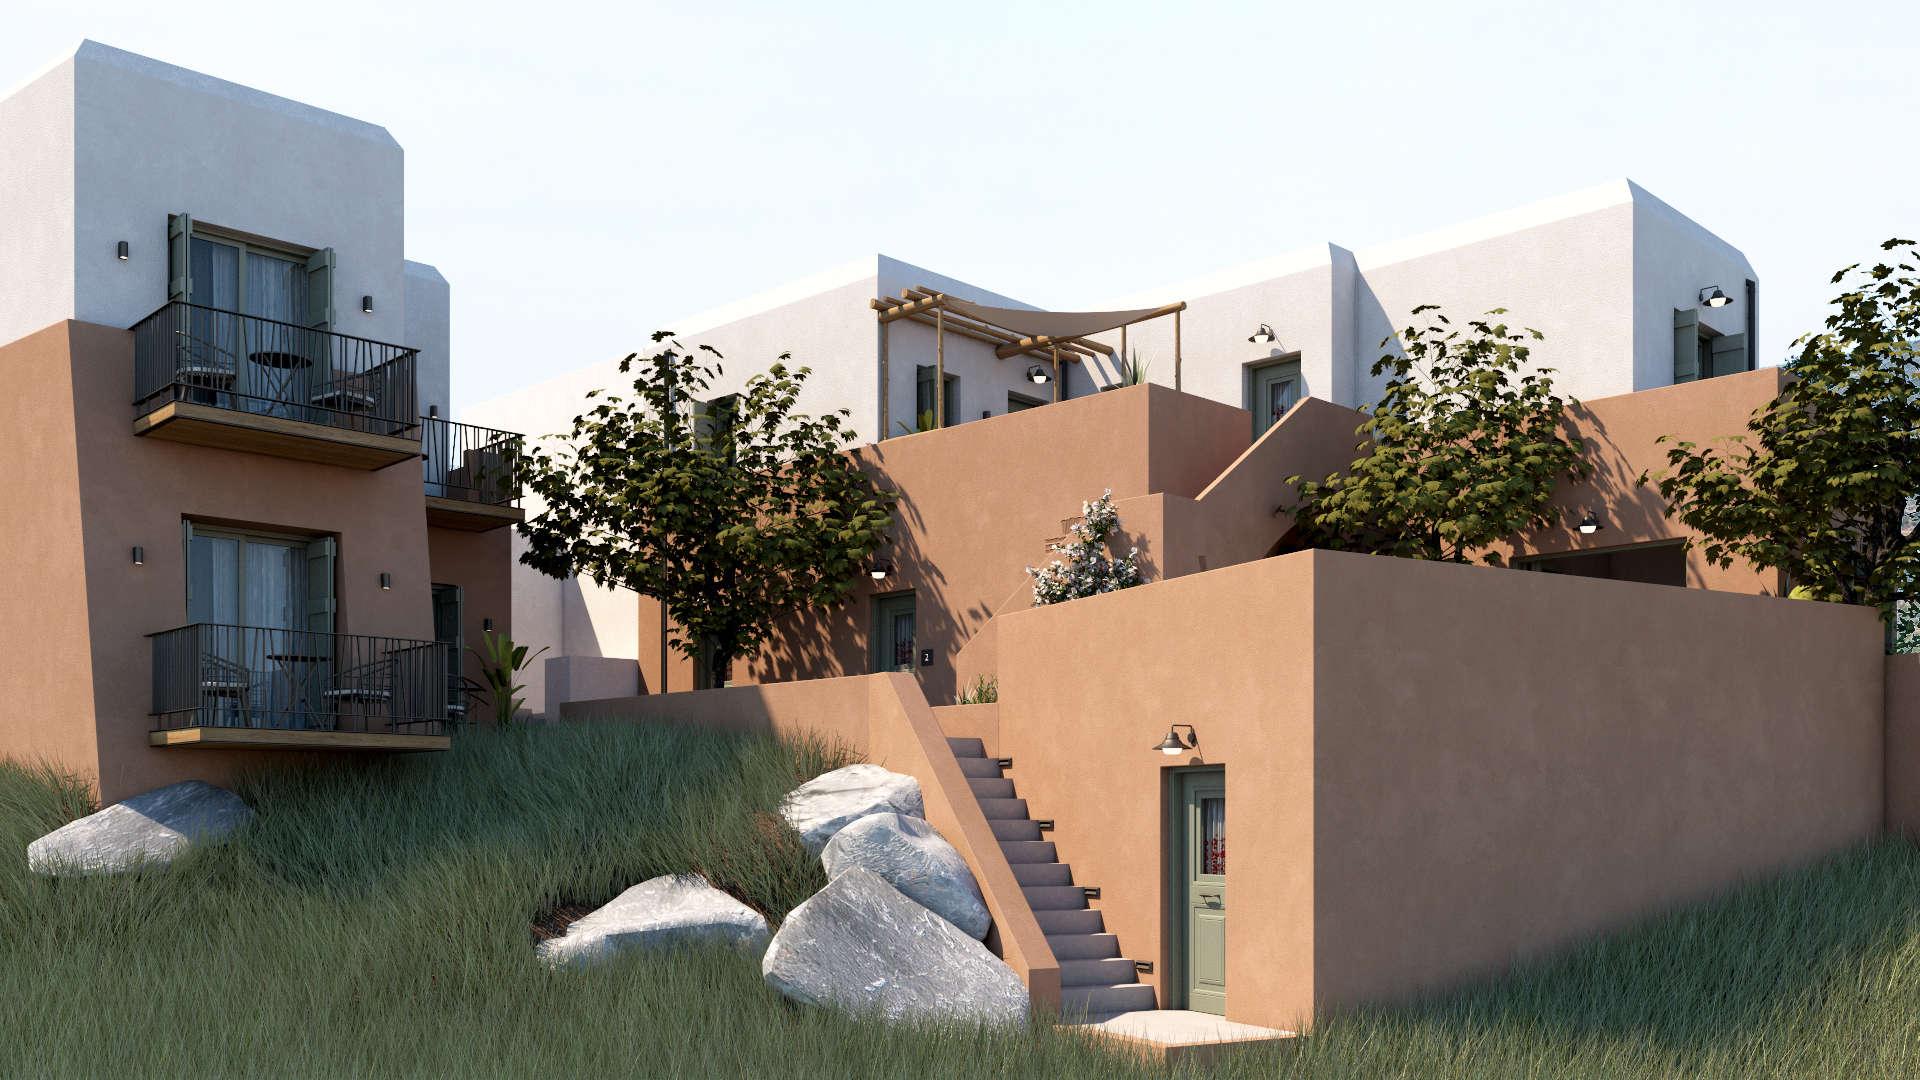 Hotel in a village, exterior design, facades. Τουριστικό κατάλυμα σε οικισμό, εξωτερικές διαμορφώσεις, όψεις.